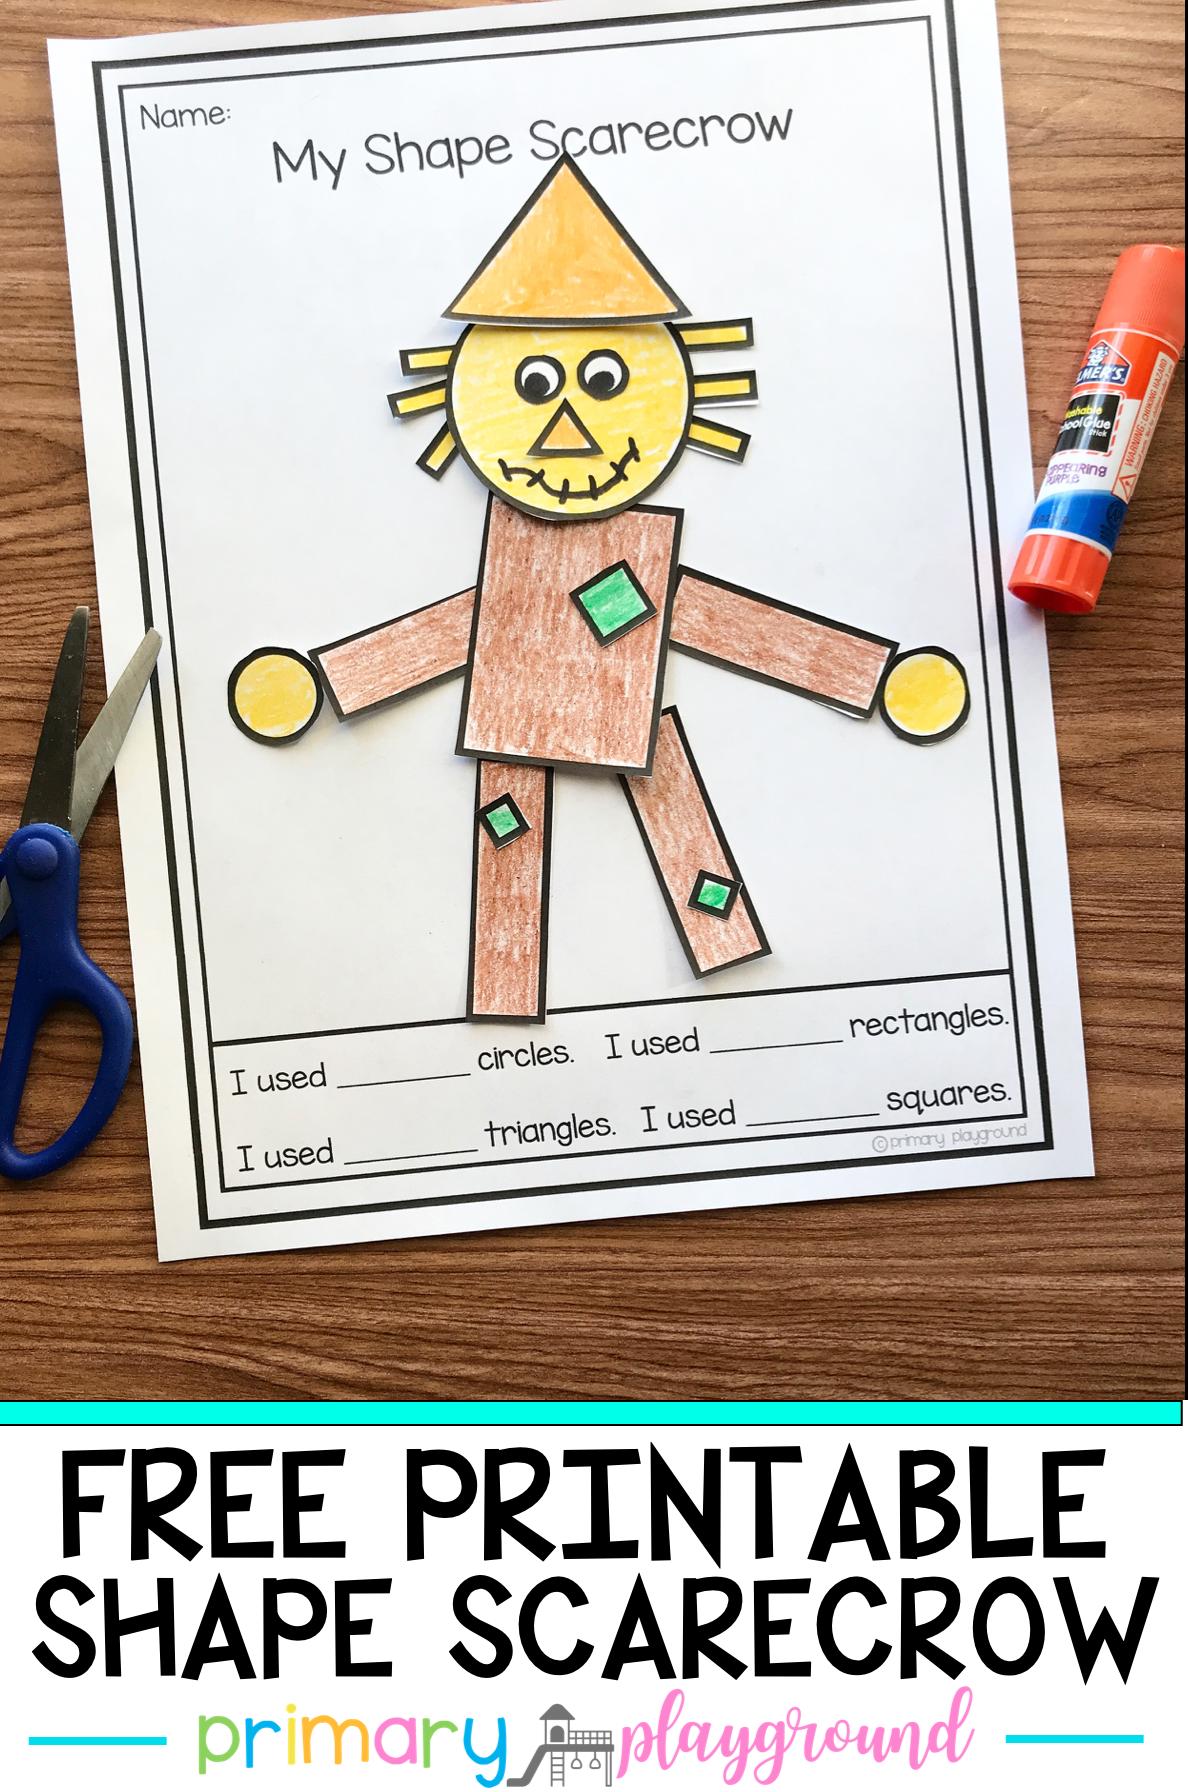 Free Printable 2d Shape Scarecrow Primary Playground Fall Preschool Activities Fall Kindergarten Shapes Kindergarten [ 1792 x 1188 Pixel ]